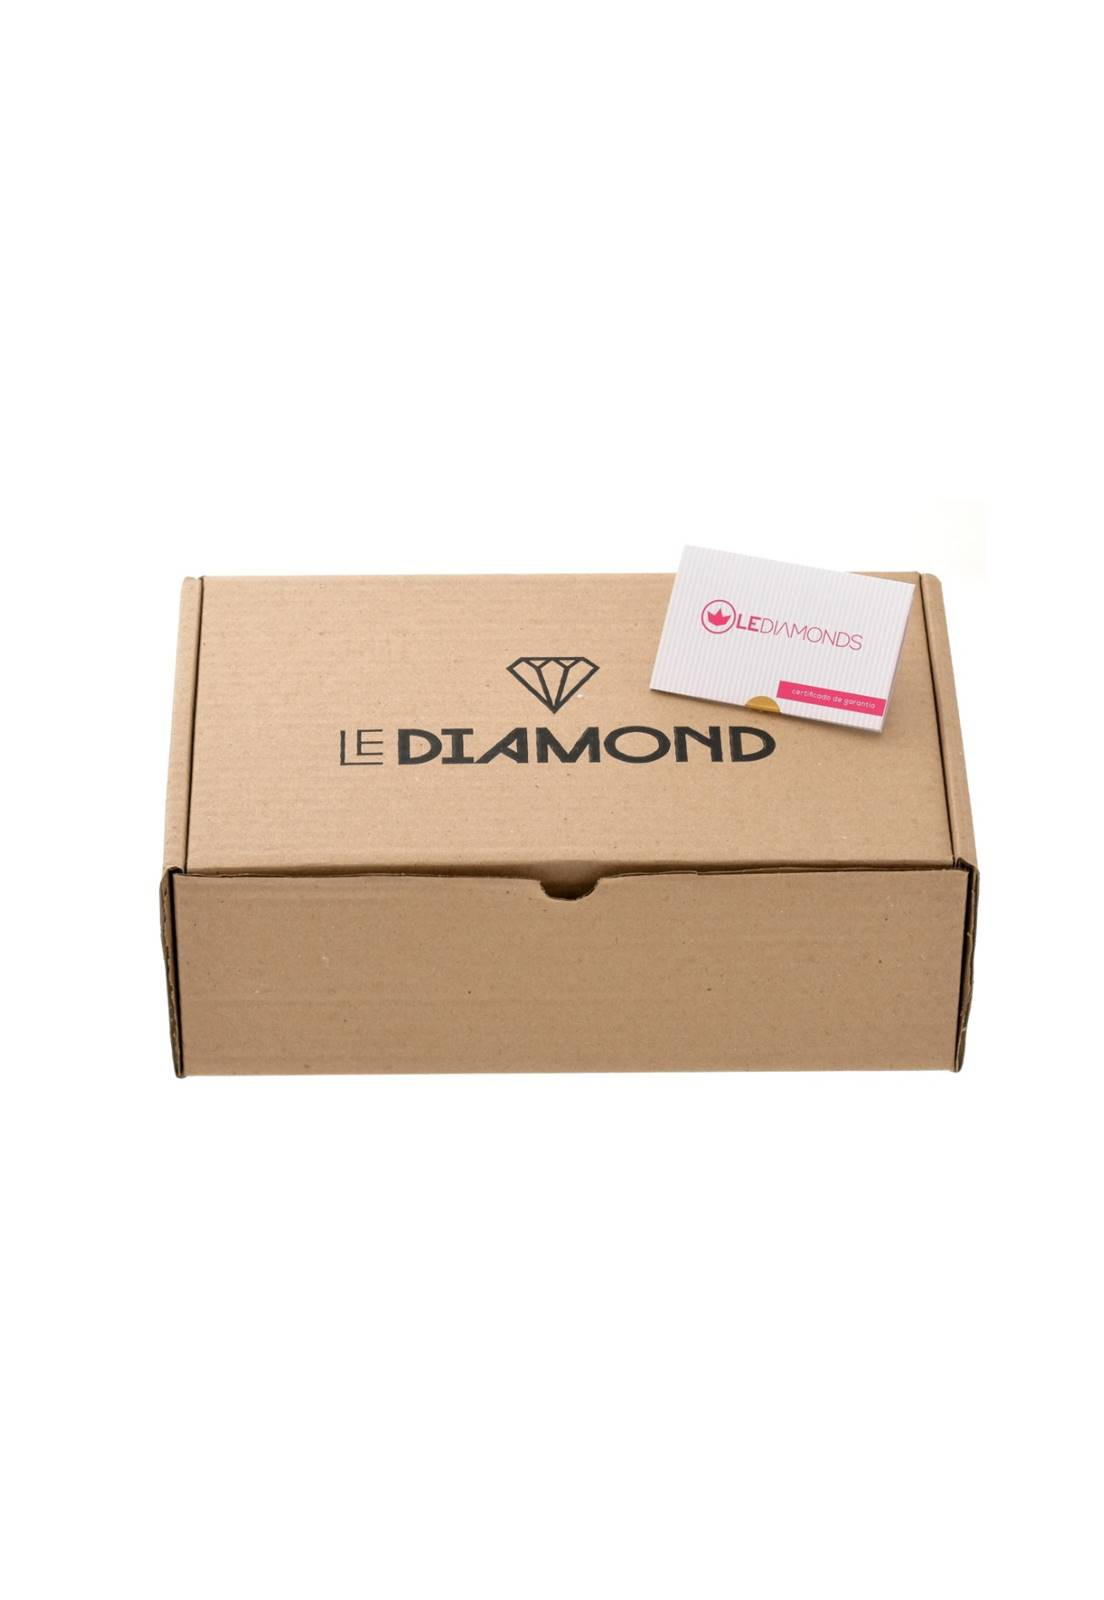 Choker Le Diamond 3 fios com Pérola ou Abs